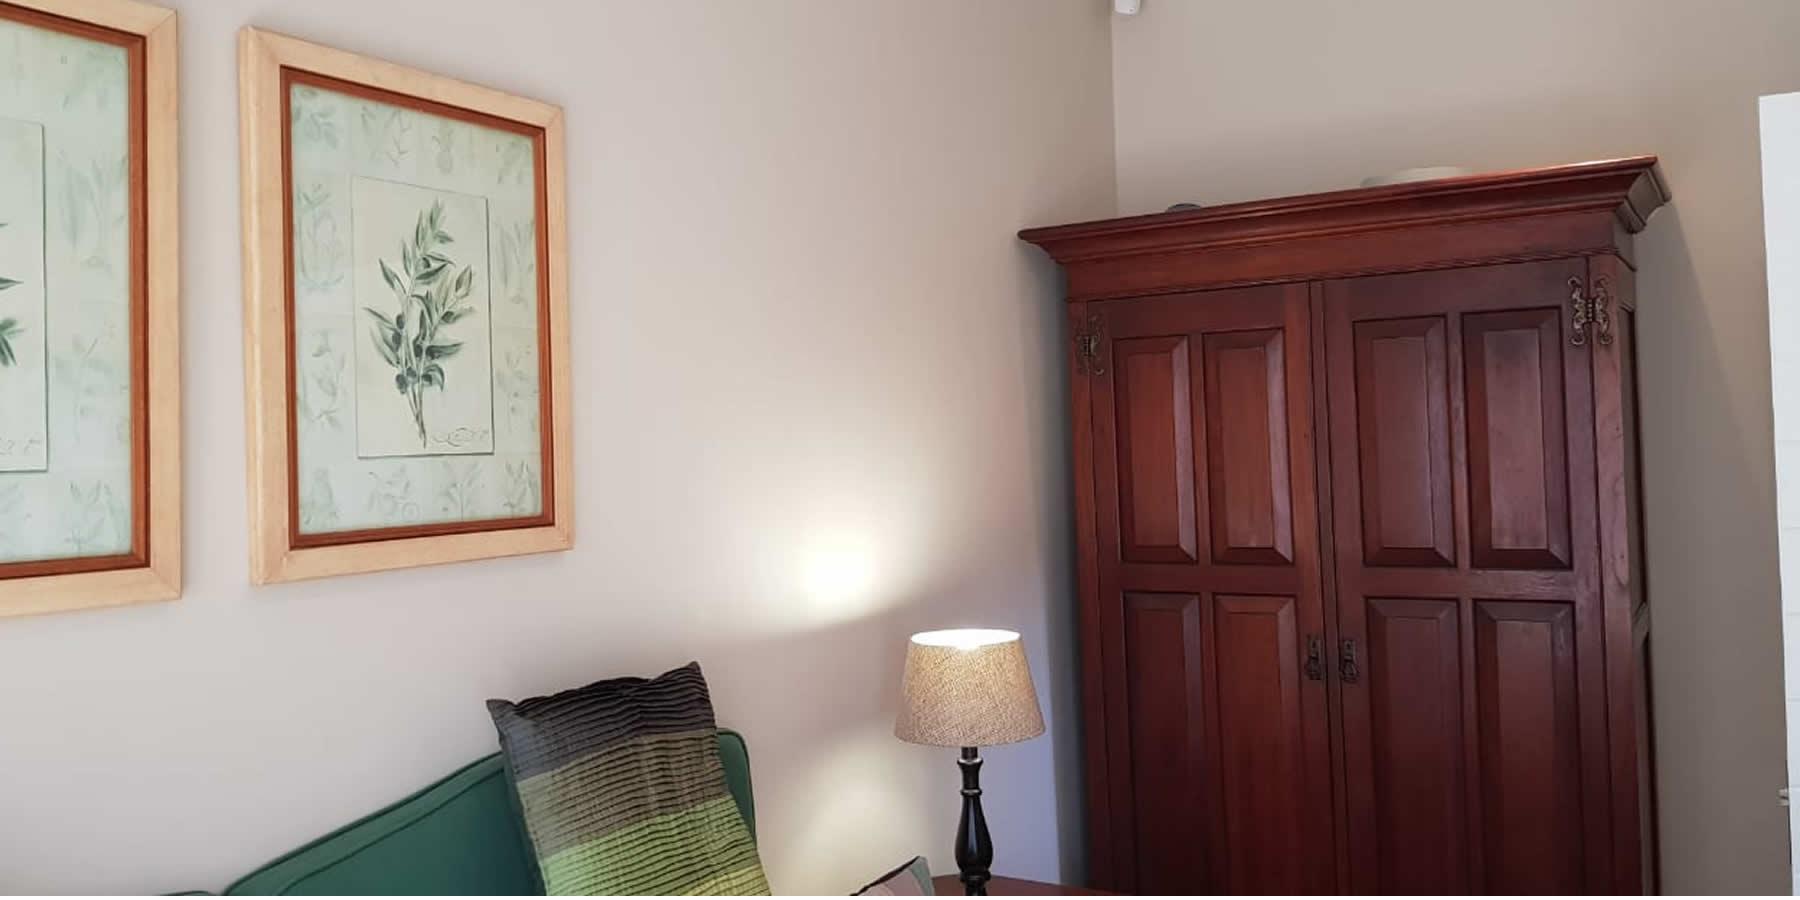 Antique room - Cupboard